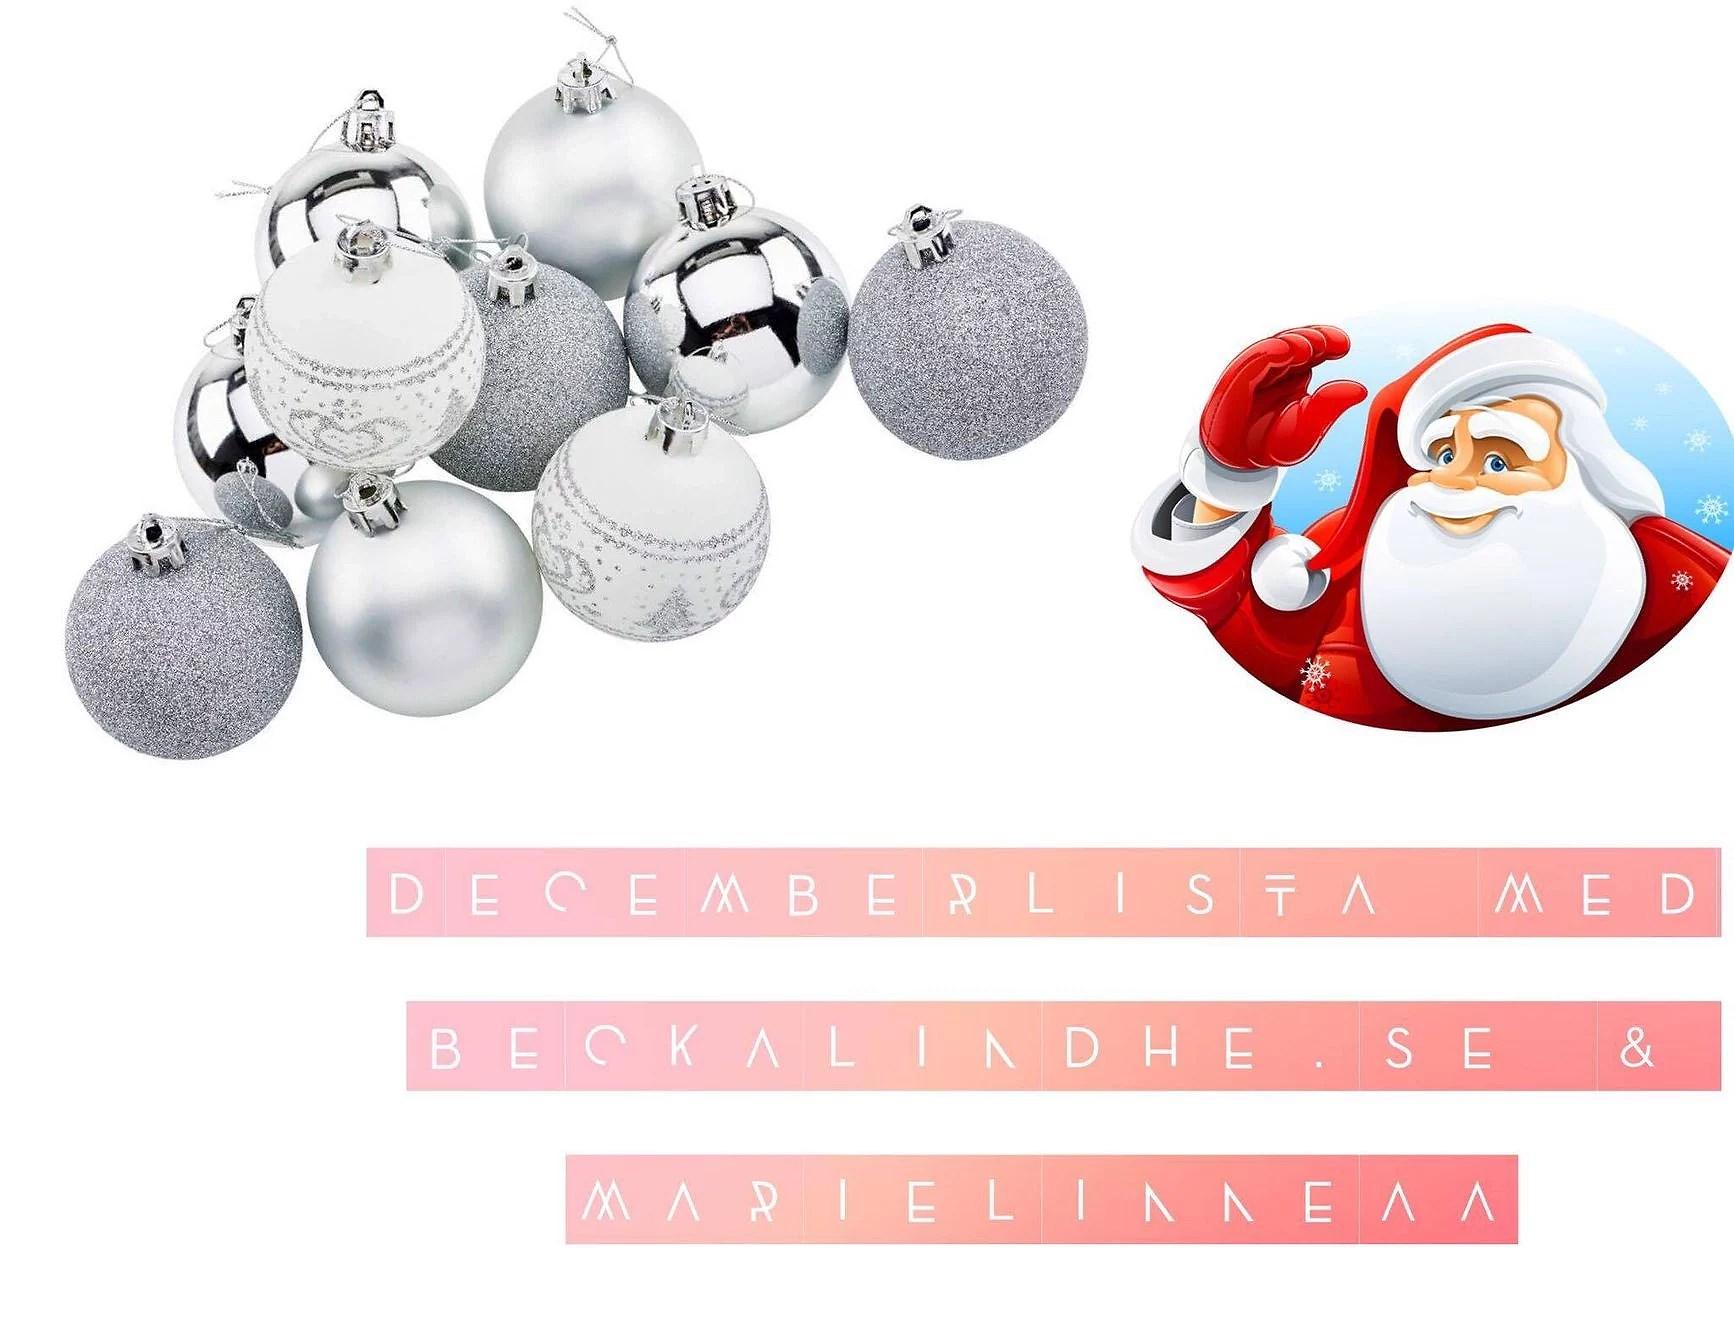 Decemberlista dag 1